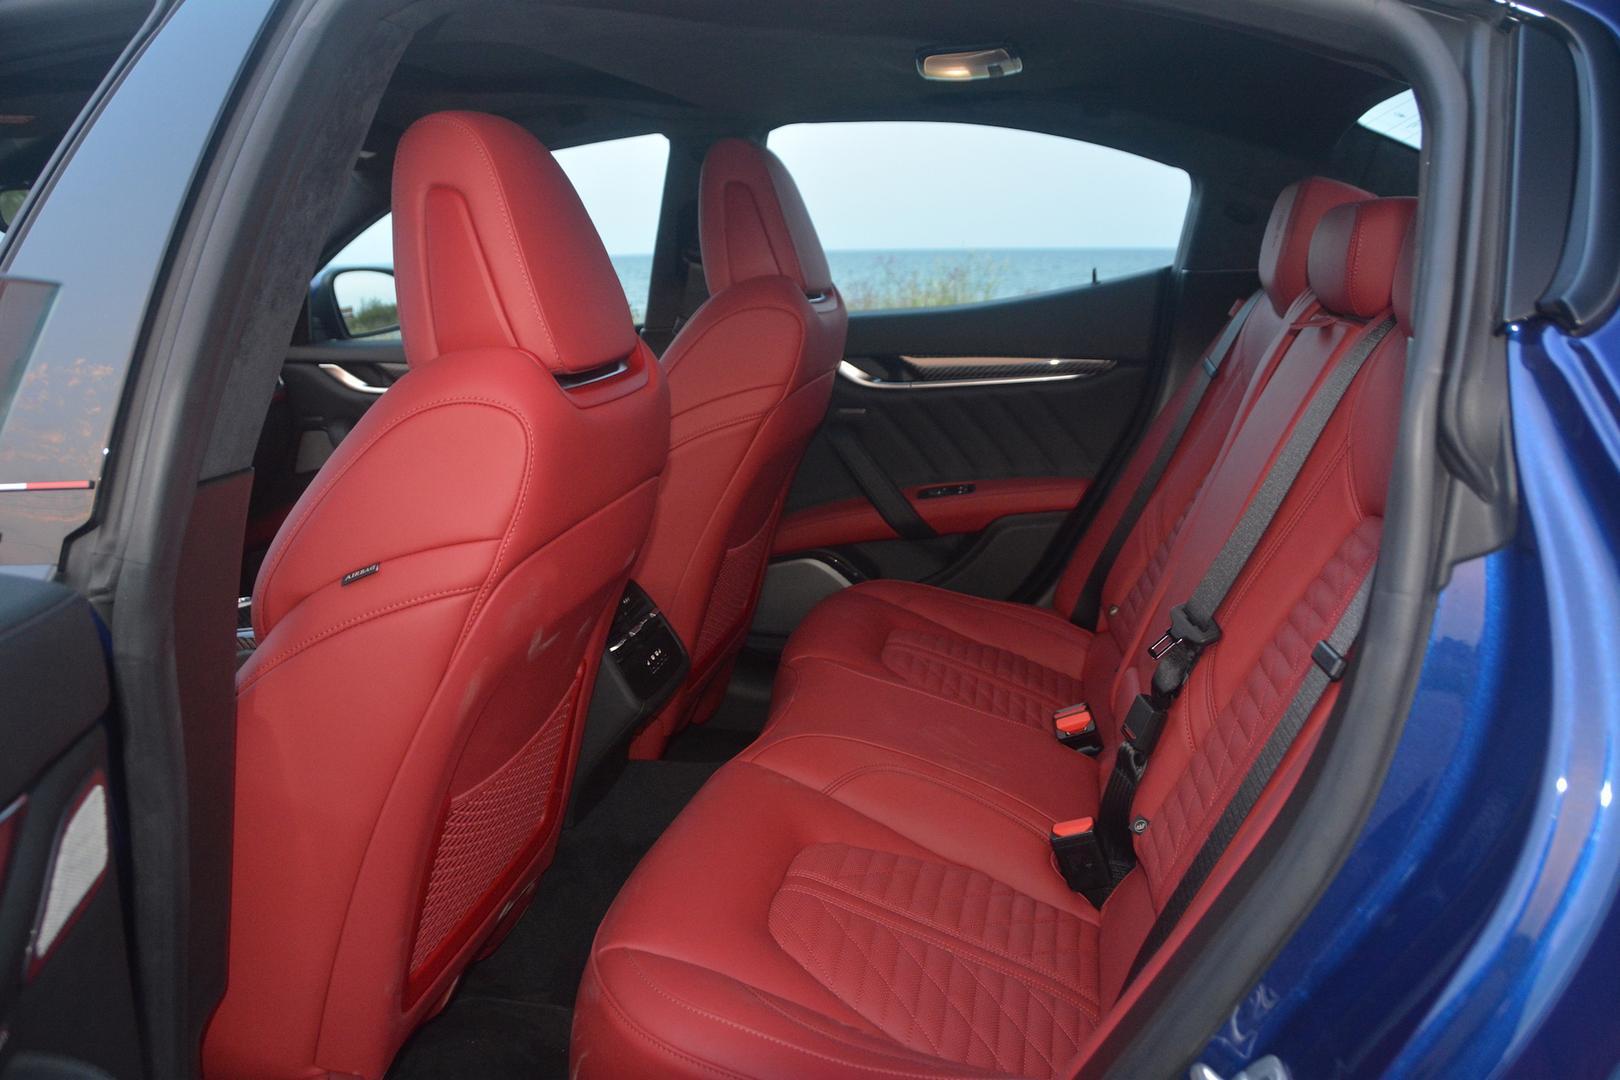 Maserati Ghibli Trofeo red leather